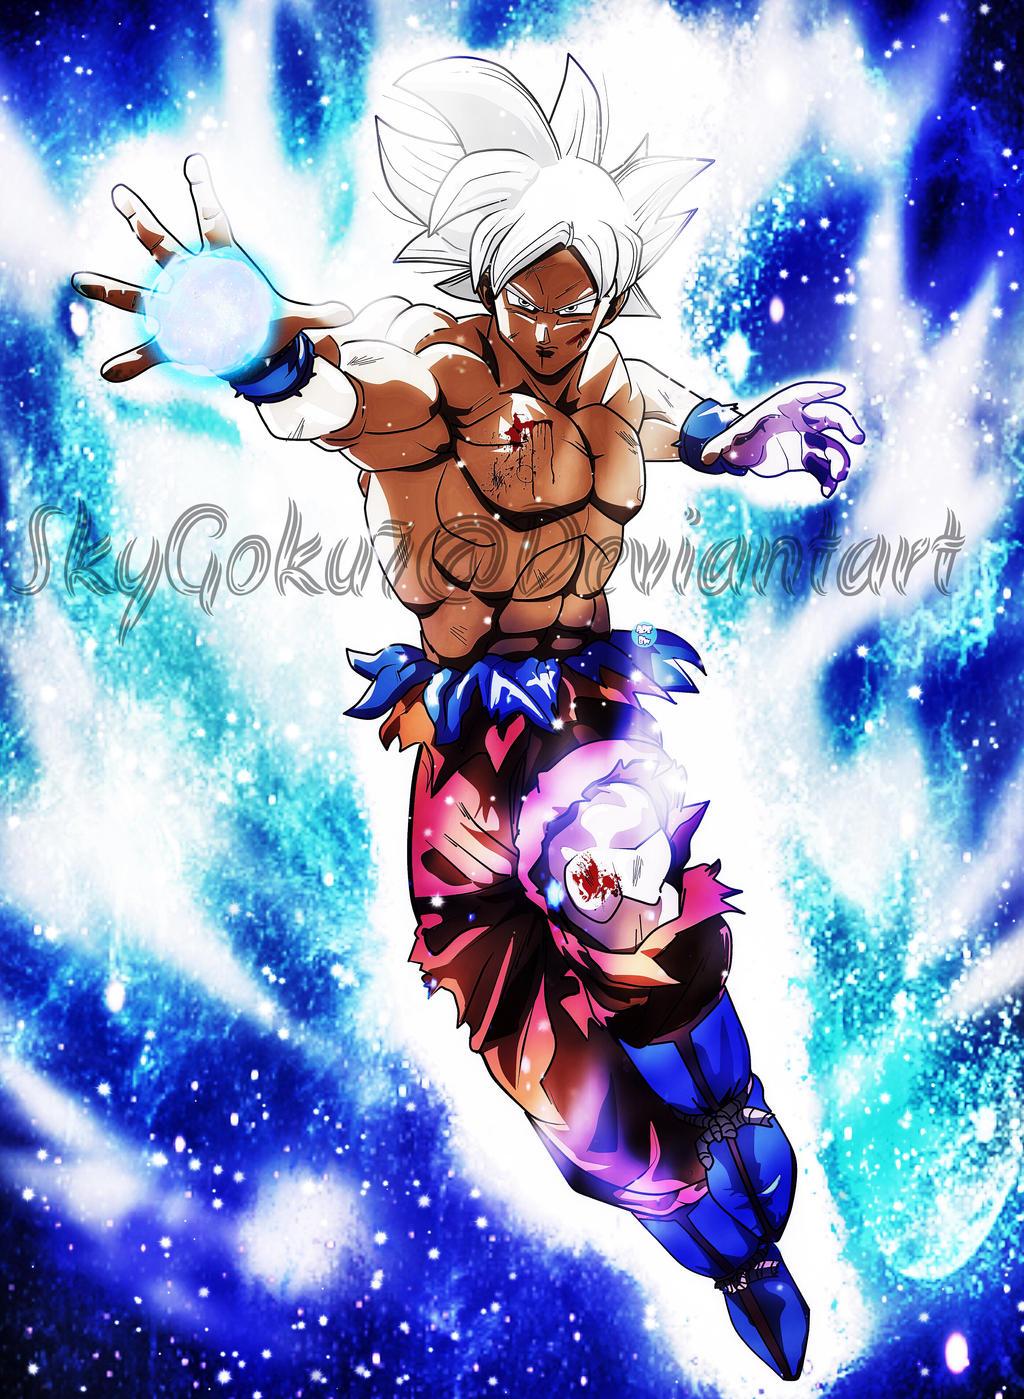 Goku mastered ultra instinct migatte no gokui by - Goku ultra instinct mastered wallpaper ...